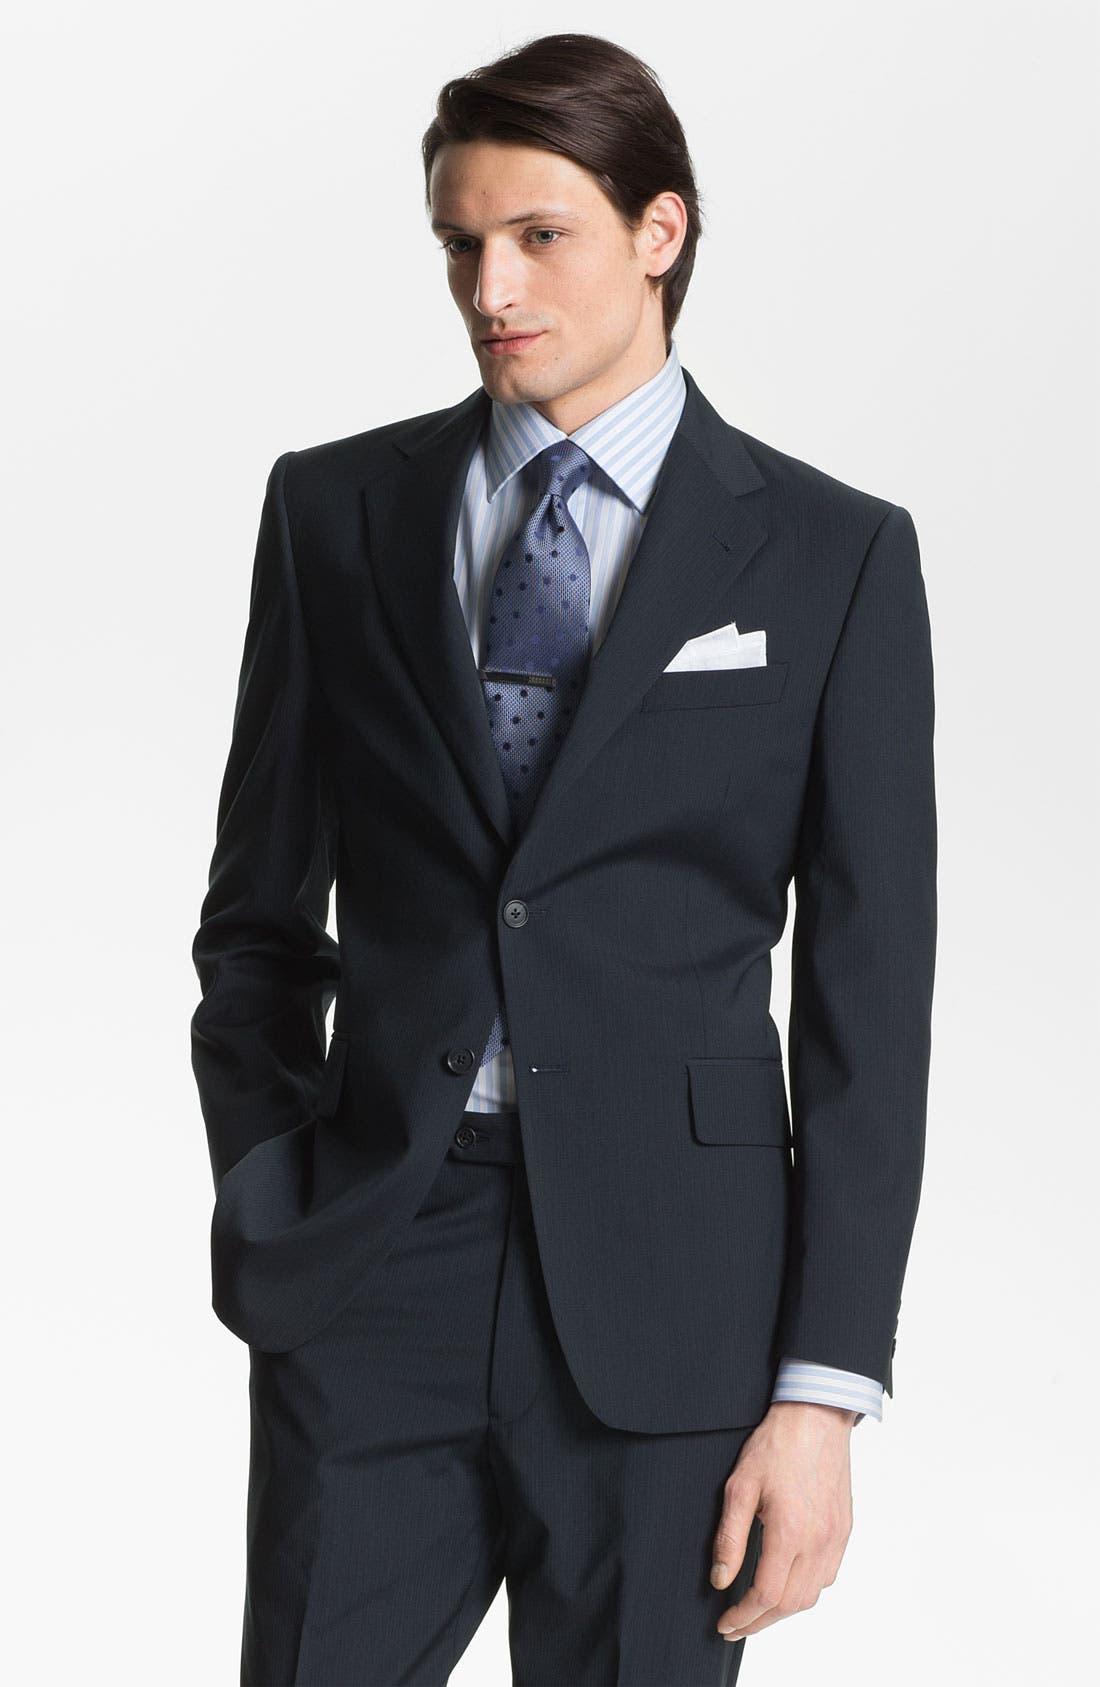 Alternate Image 1 Selected - Joseph Abboud 'Signature Silver' Wool Suit